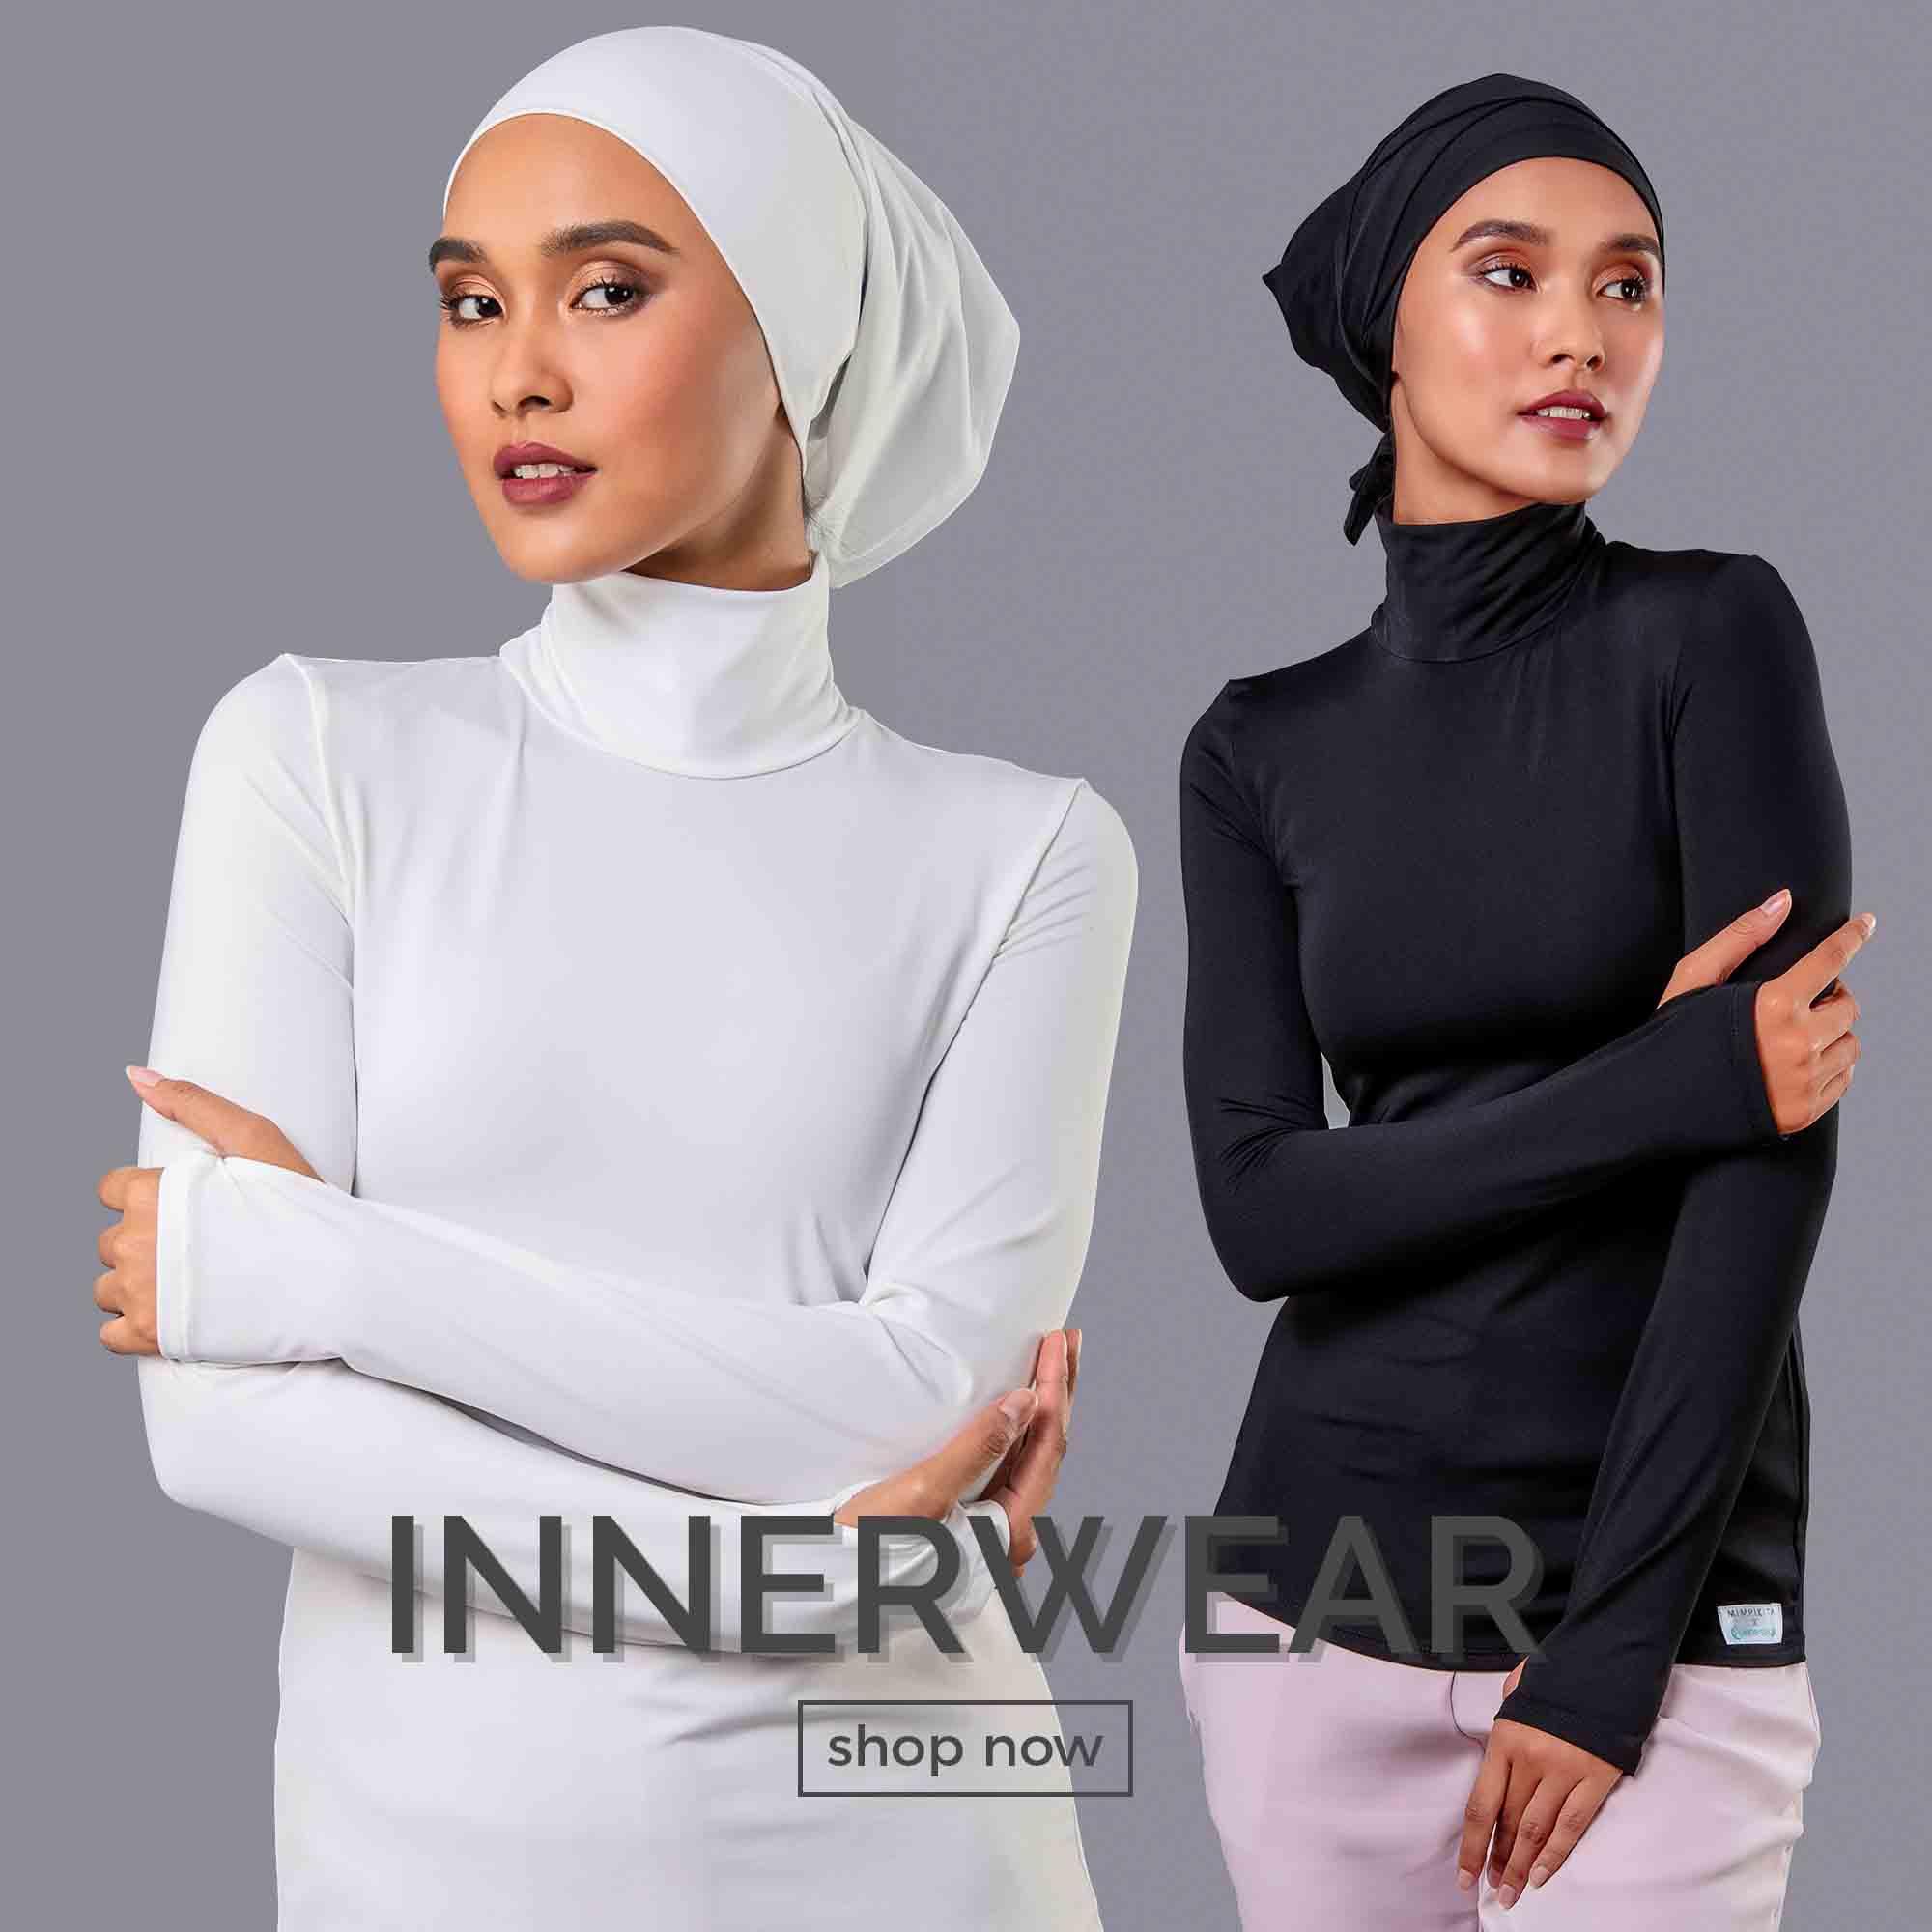 innerwear.jpg